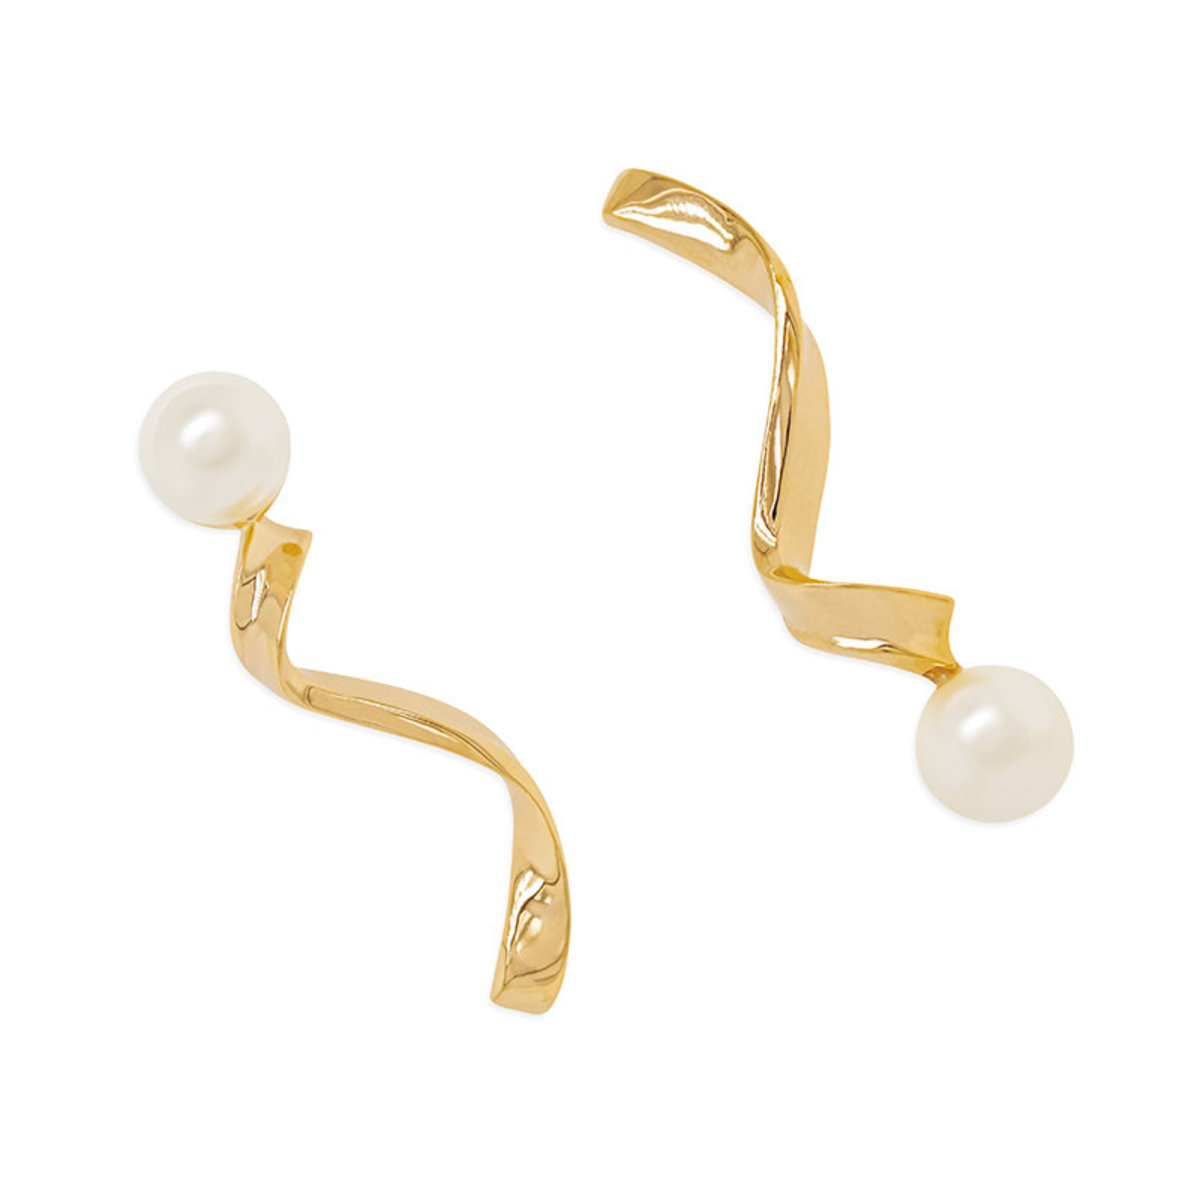 Ruffles Pearl: gold plating, Swarovski pearl pierced earrings